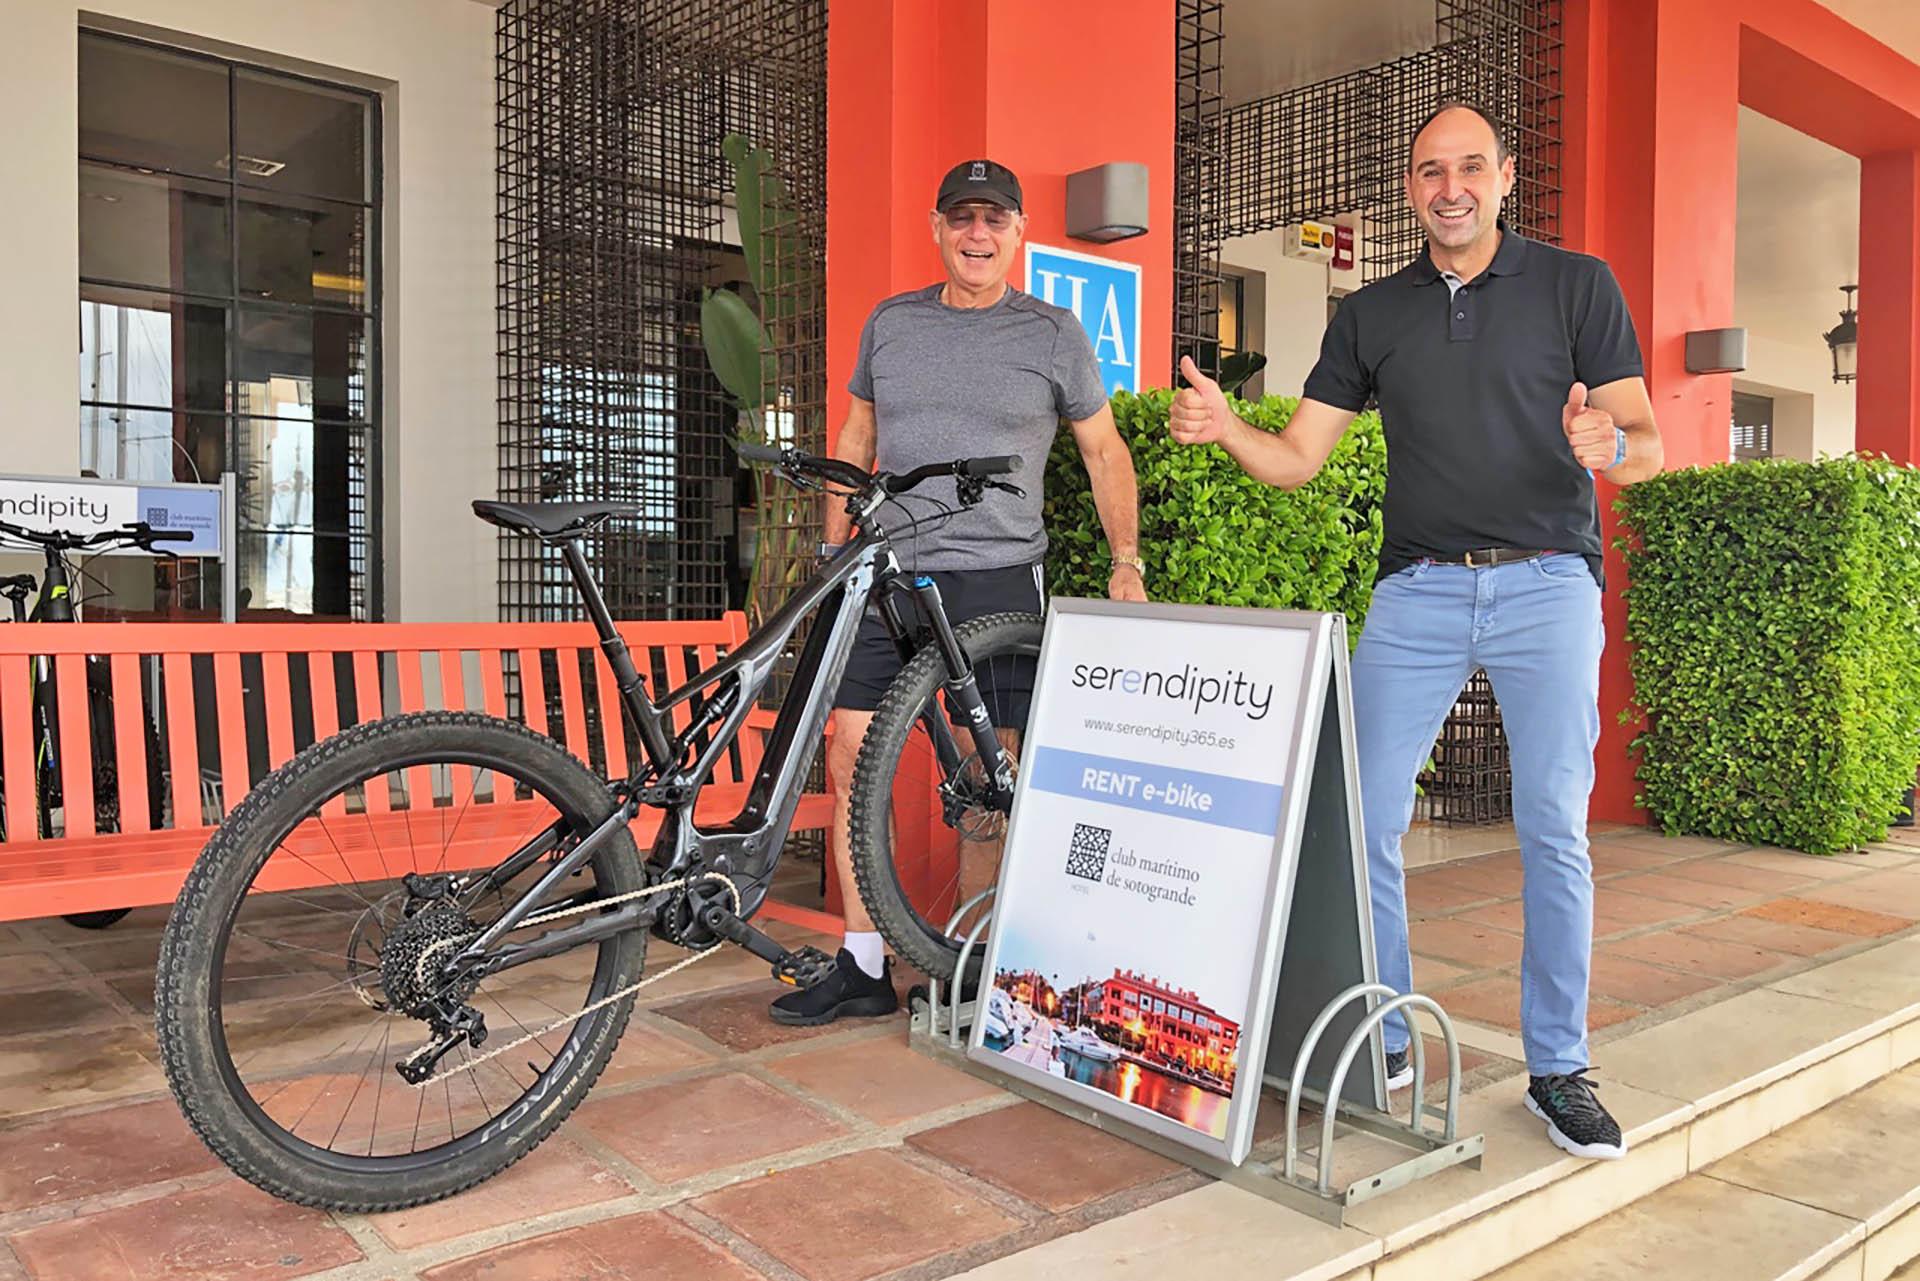 Test drive of Serendipity's E-Bike at Sotogrande!